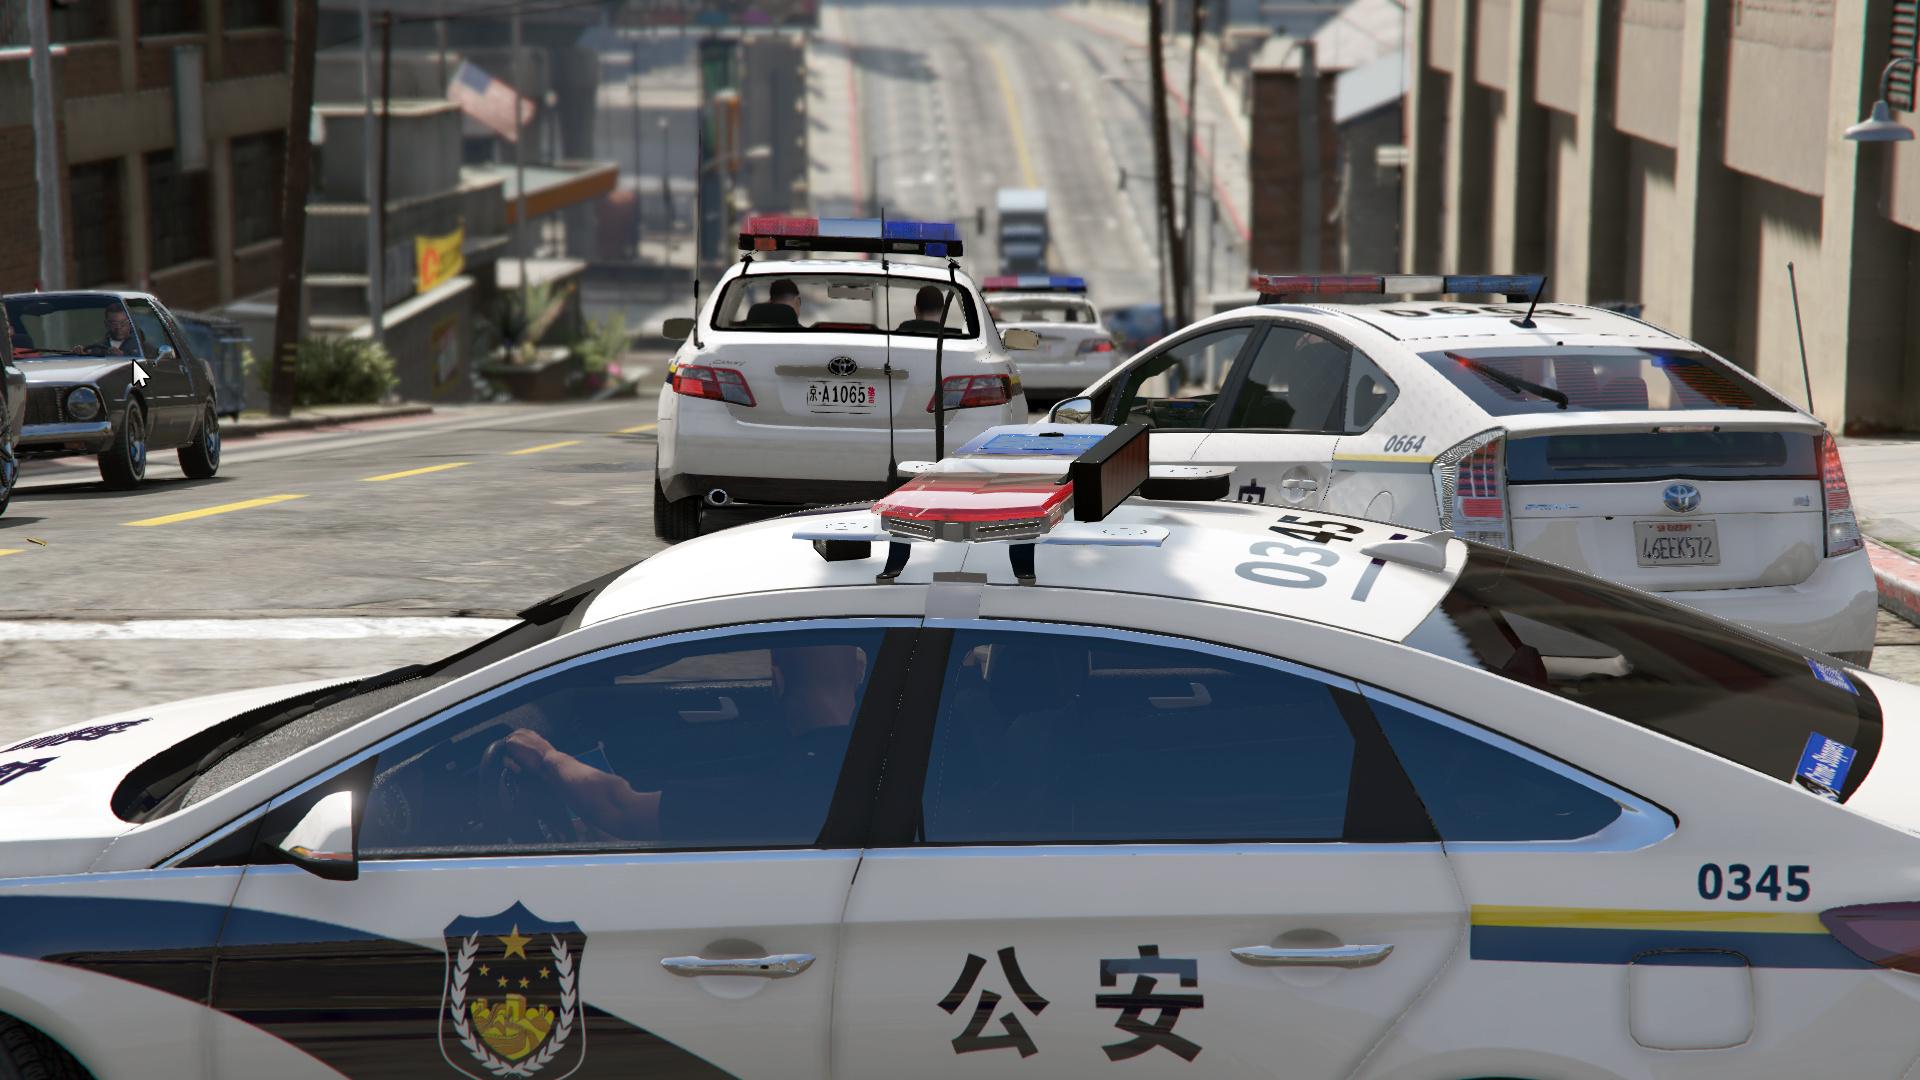 Toyota Camry Chinese Police 丰田凯美瑞警车标准涂